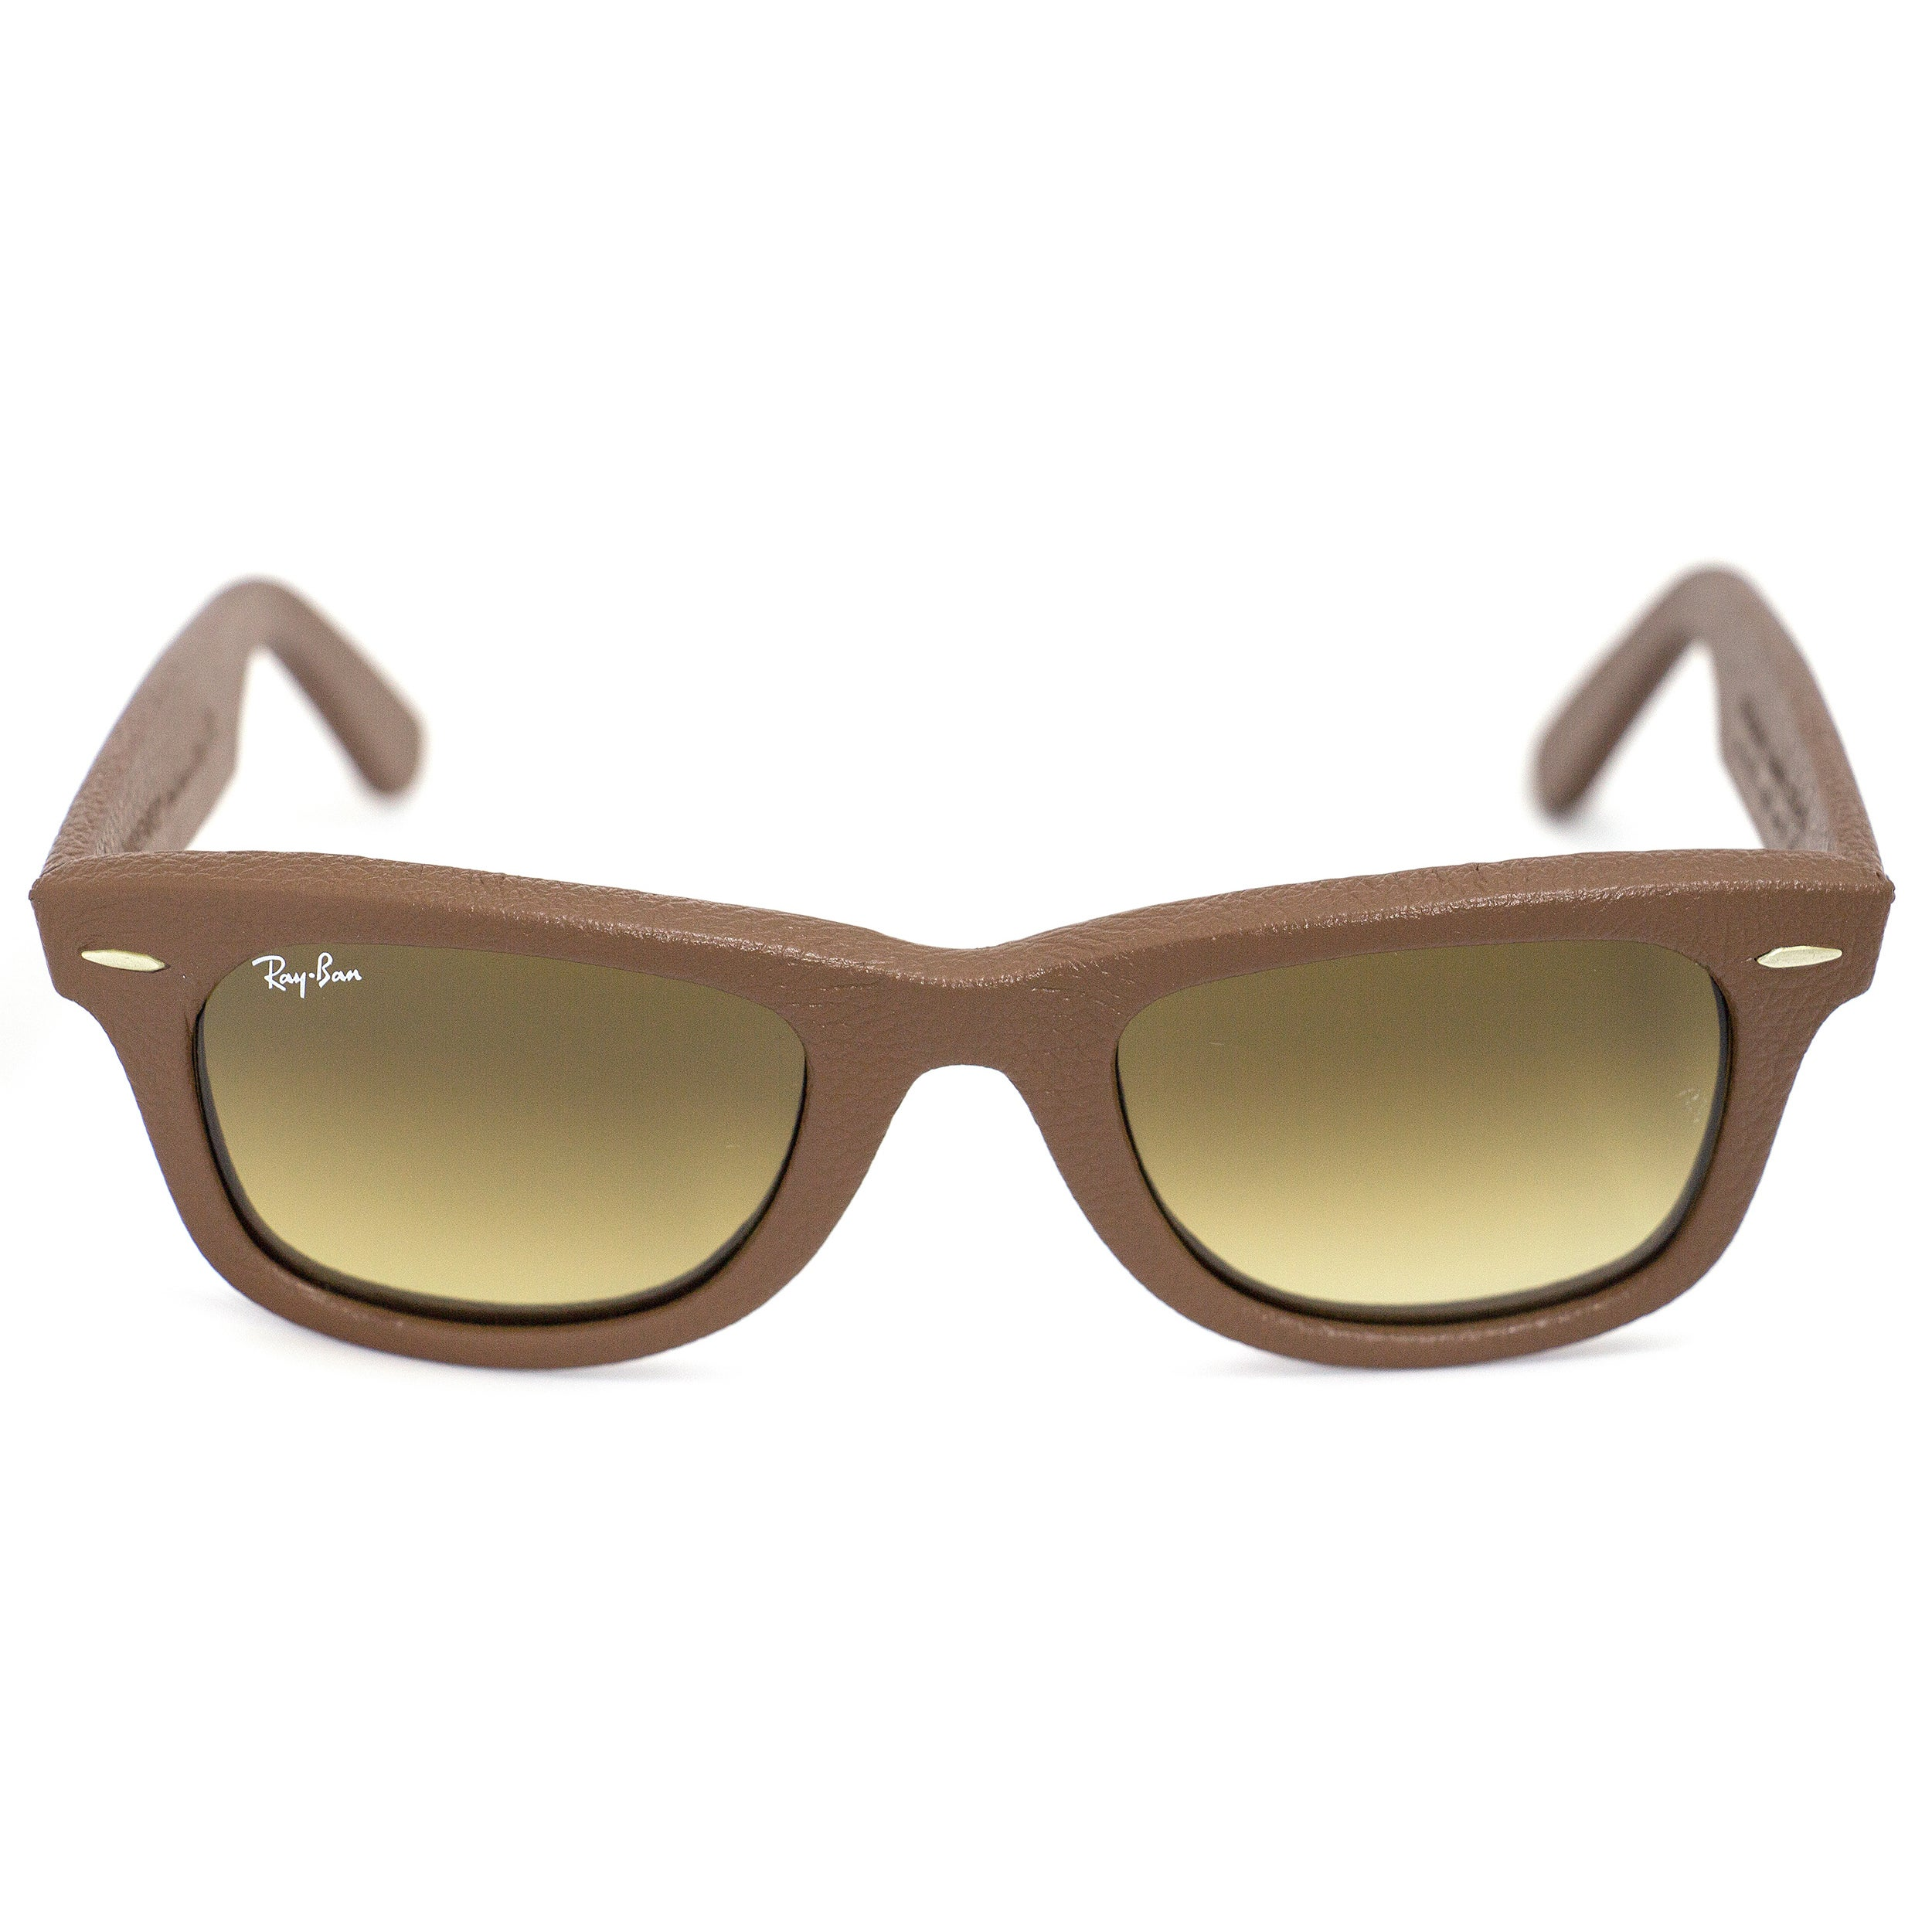 be2570430 ... spain shop ray ban wayfarer leather rb2140qm 1169 85 bronze copper  frame brown gradient lens sunglasses